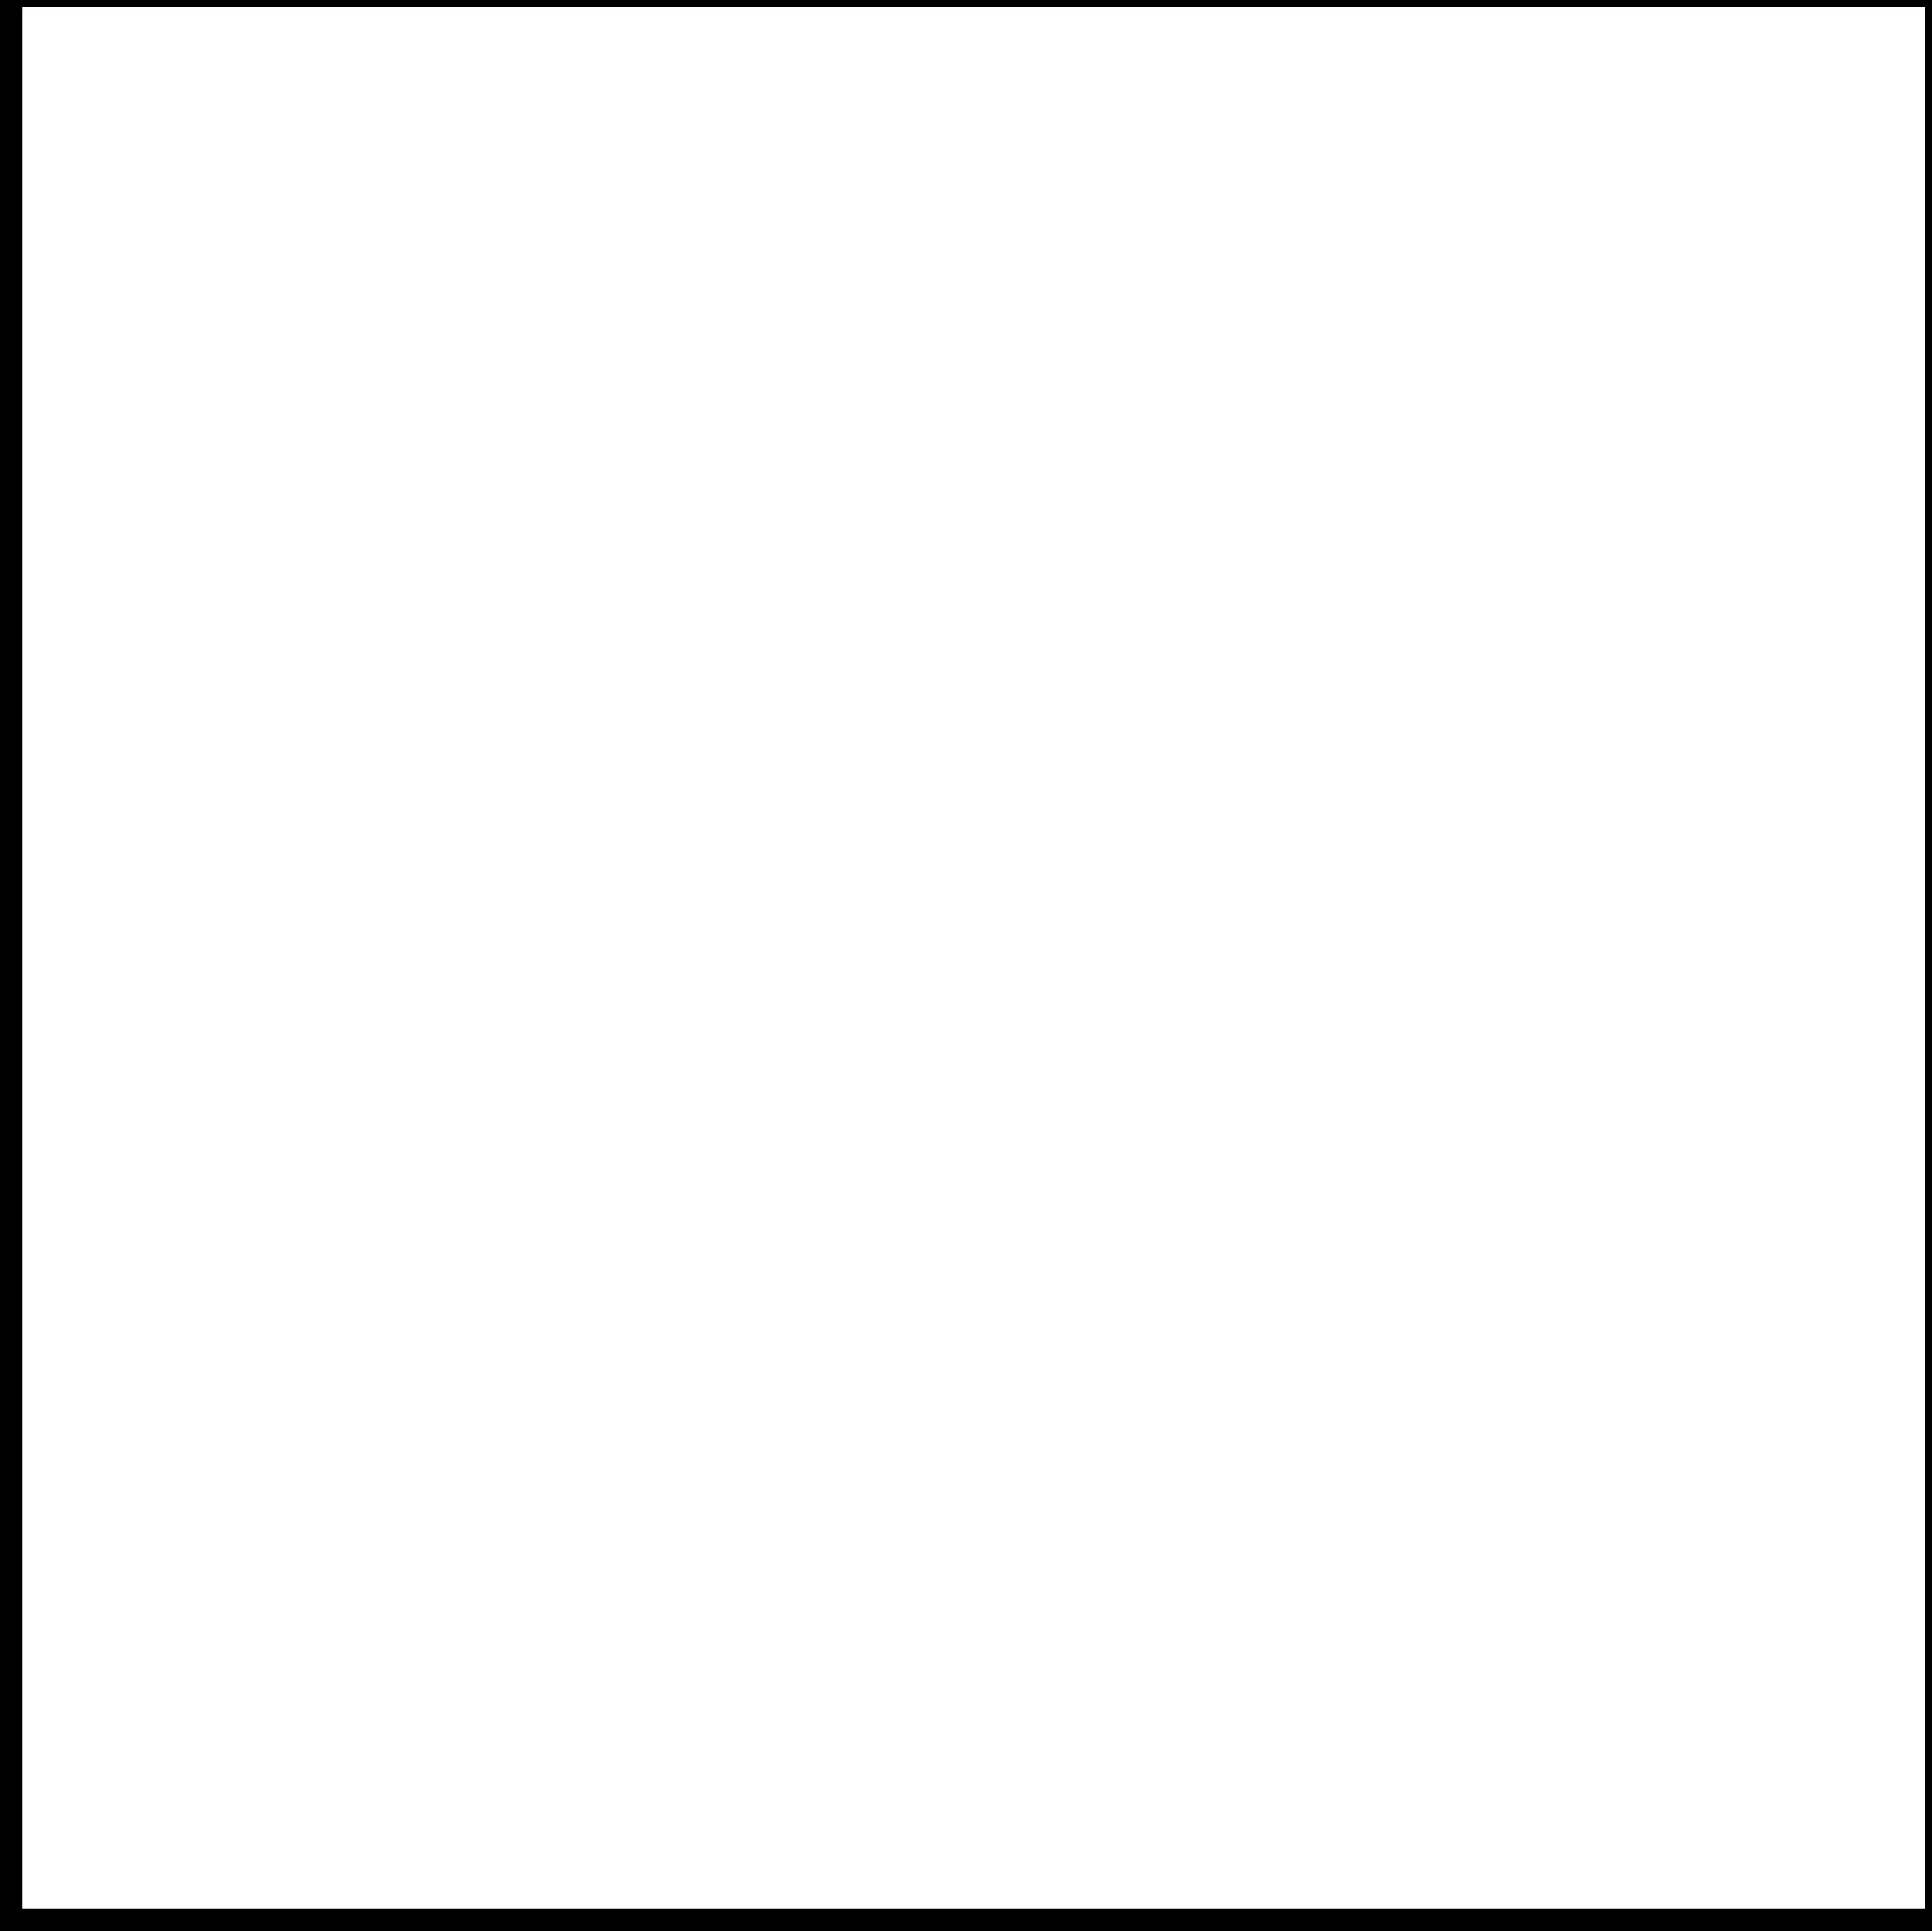 Mantel BLANCO Rectangular 1,5x2,1m [enstockpara envíooretiro]